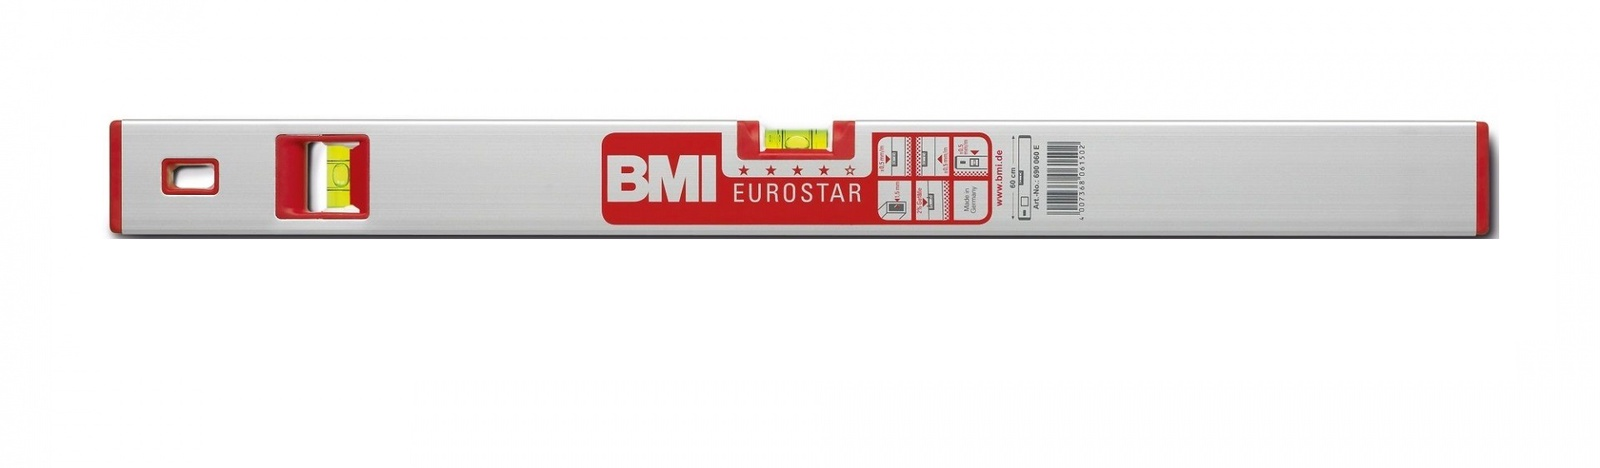 Уровень противоударный EUROSTAR 1000 мм угол 2град. BMI 690100E